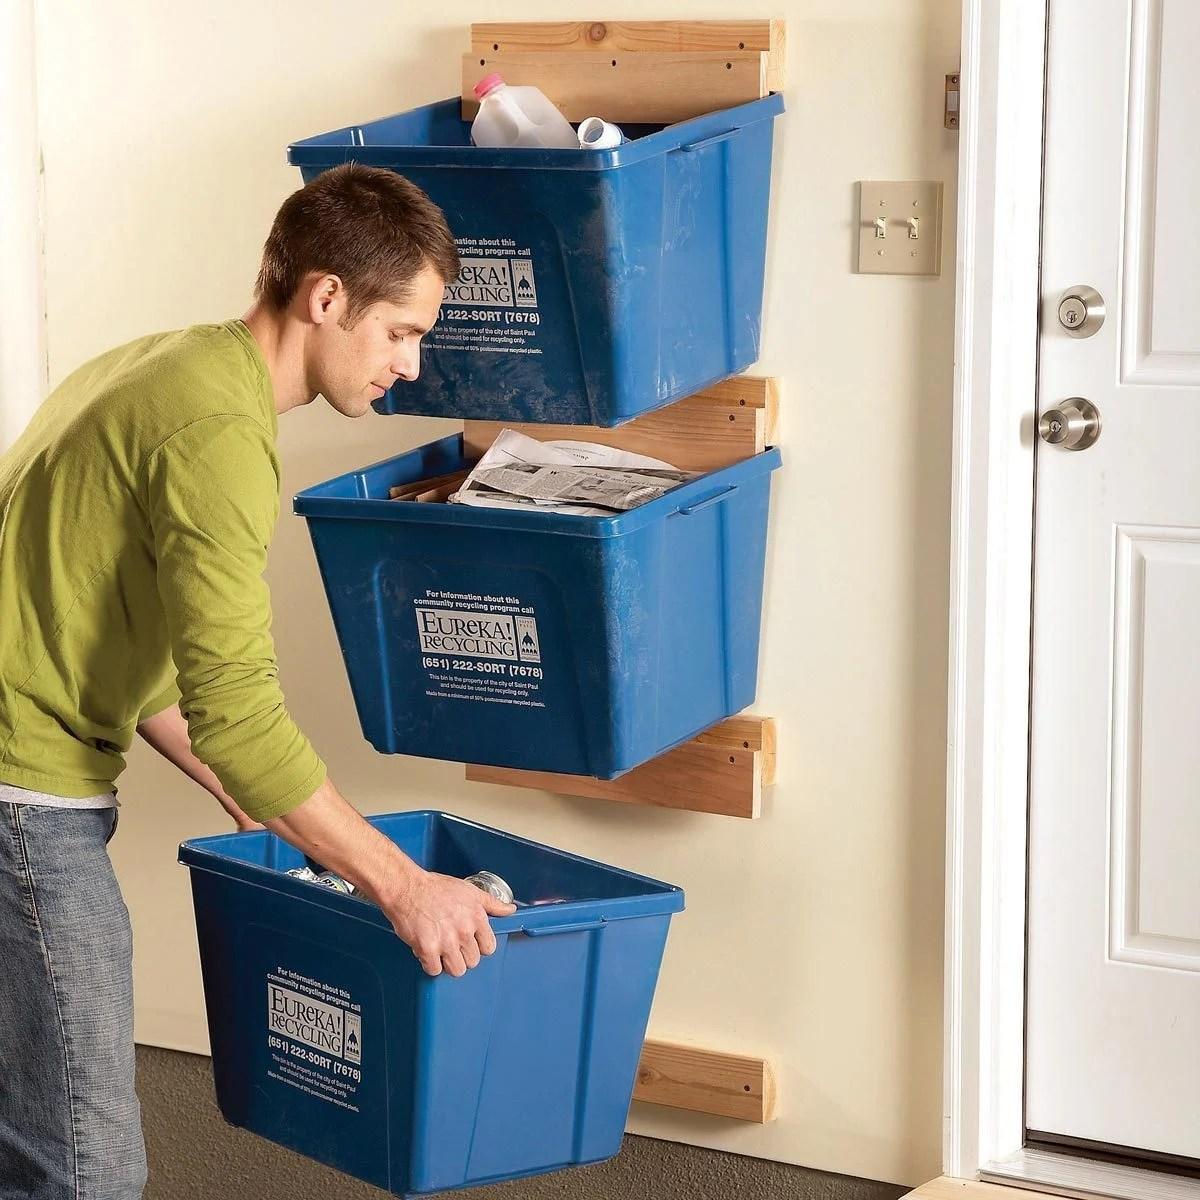 15 Mudroom Organization Ideas The Family Handyman